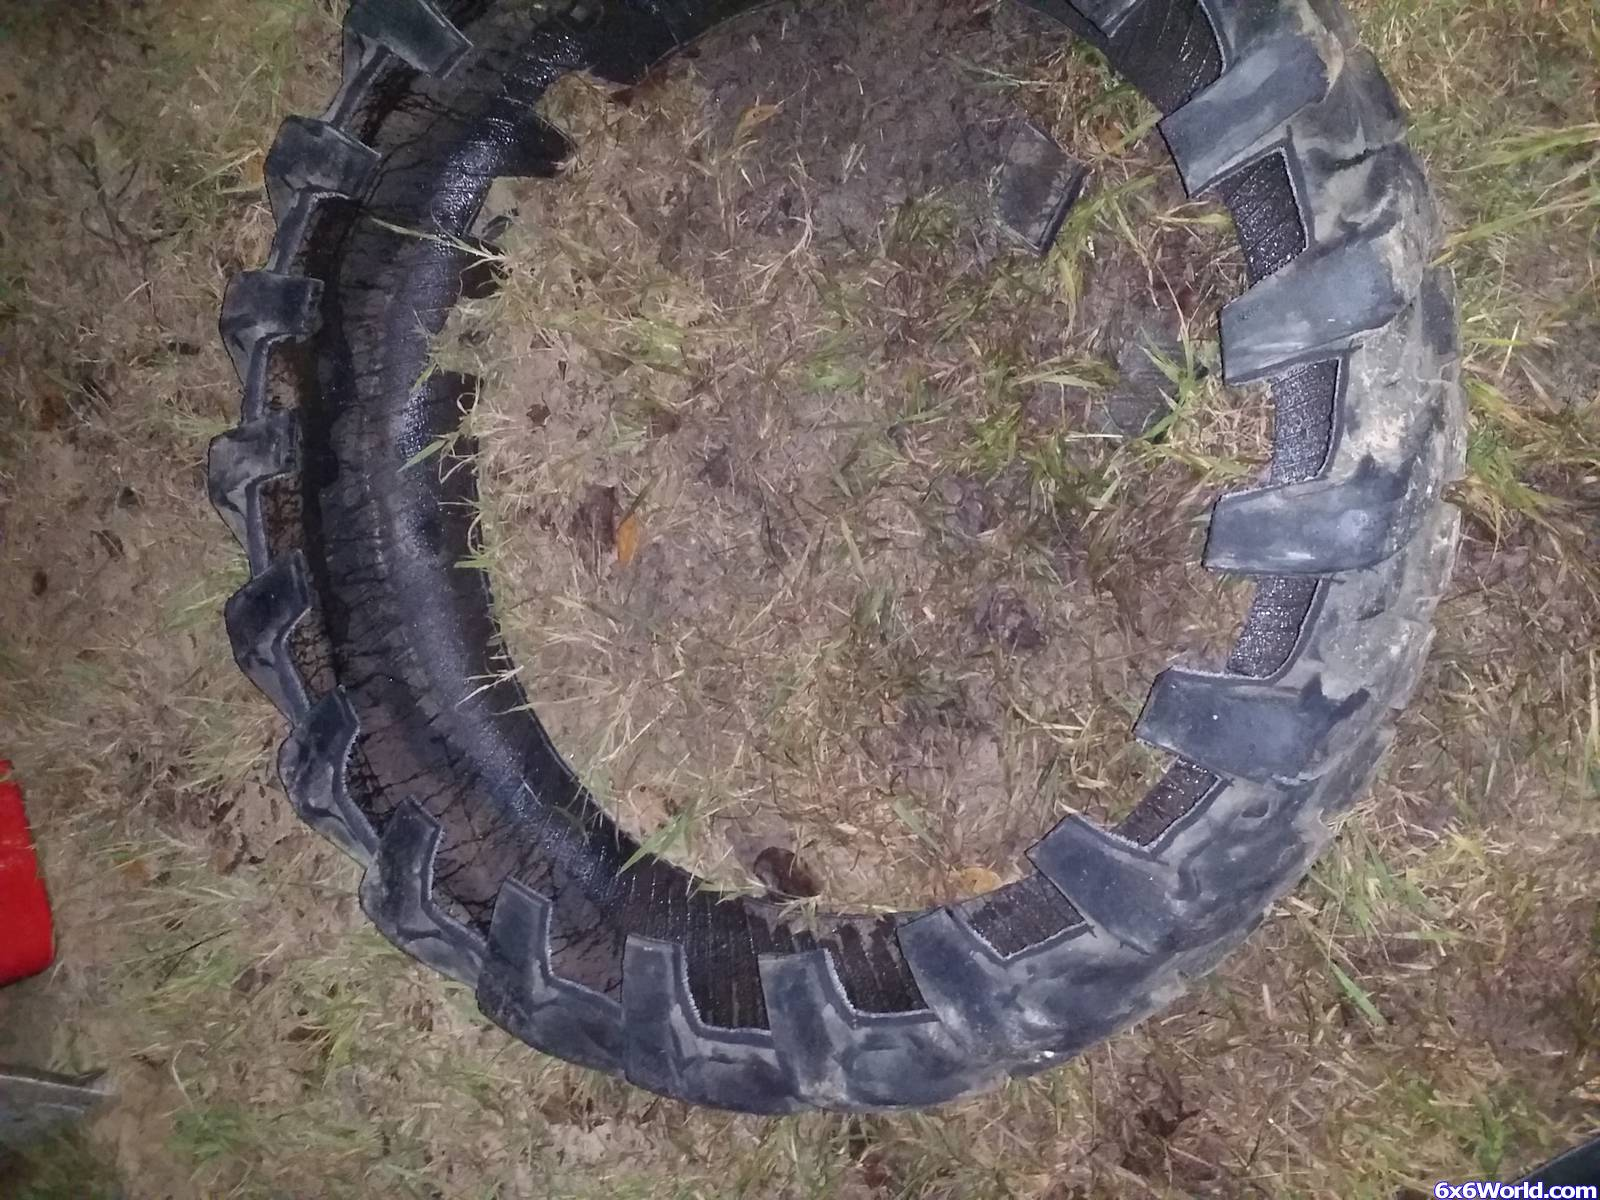 homemade tracks - Amphibious ATV Pictures